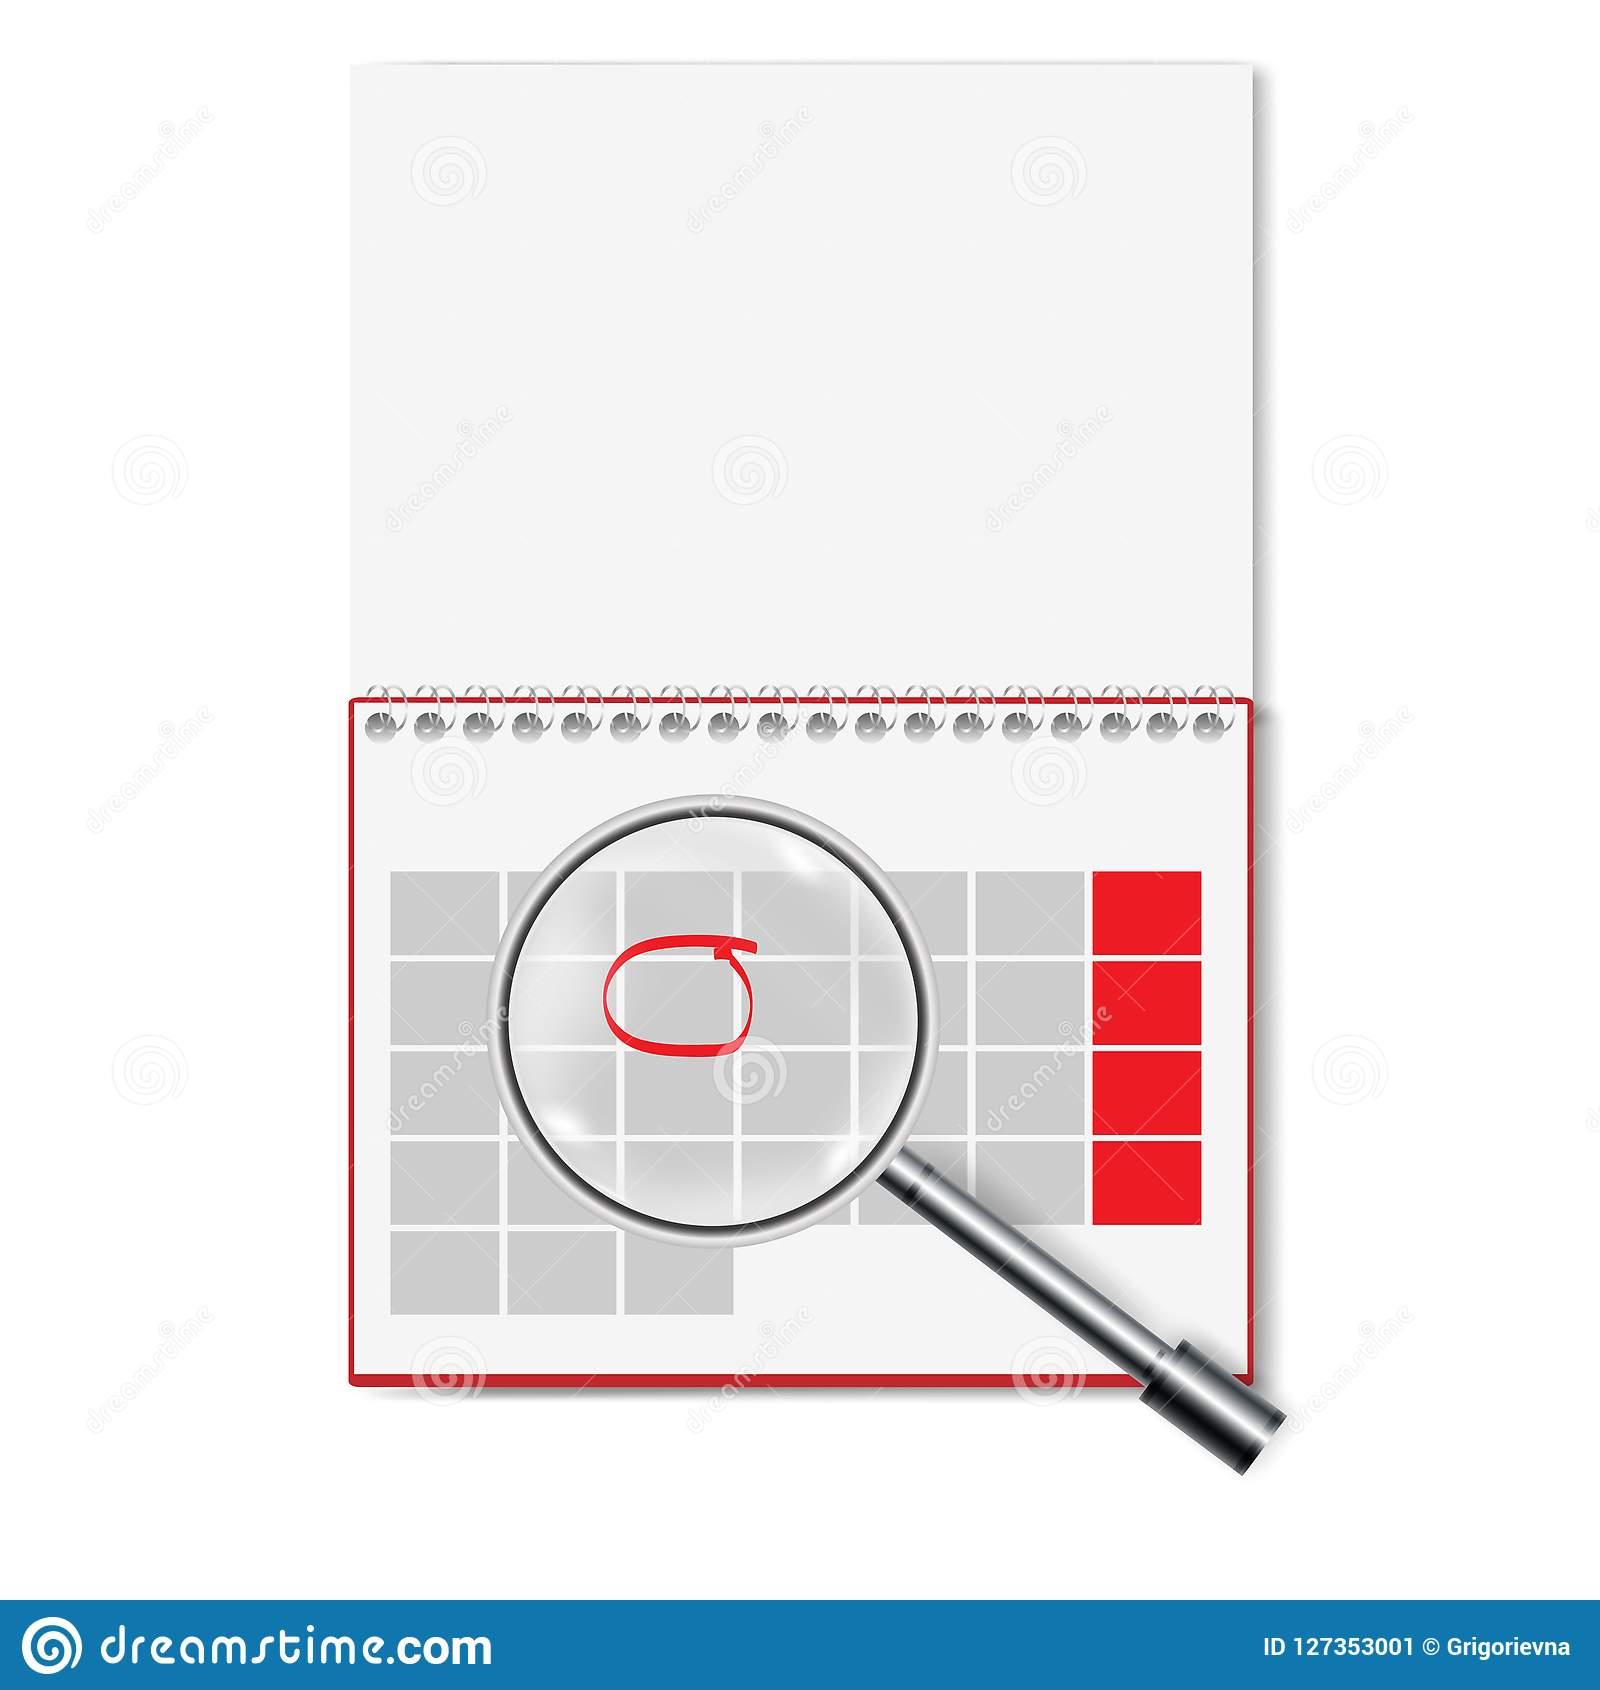 Vector Illustration Of Blank Calendar Stock Vector - Illustration Of